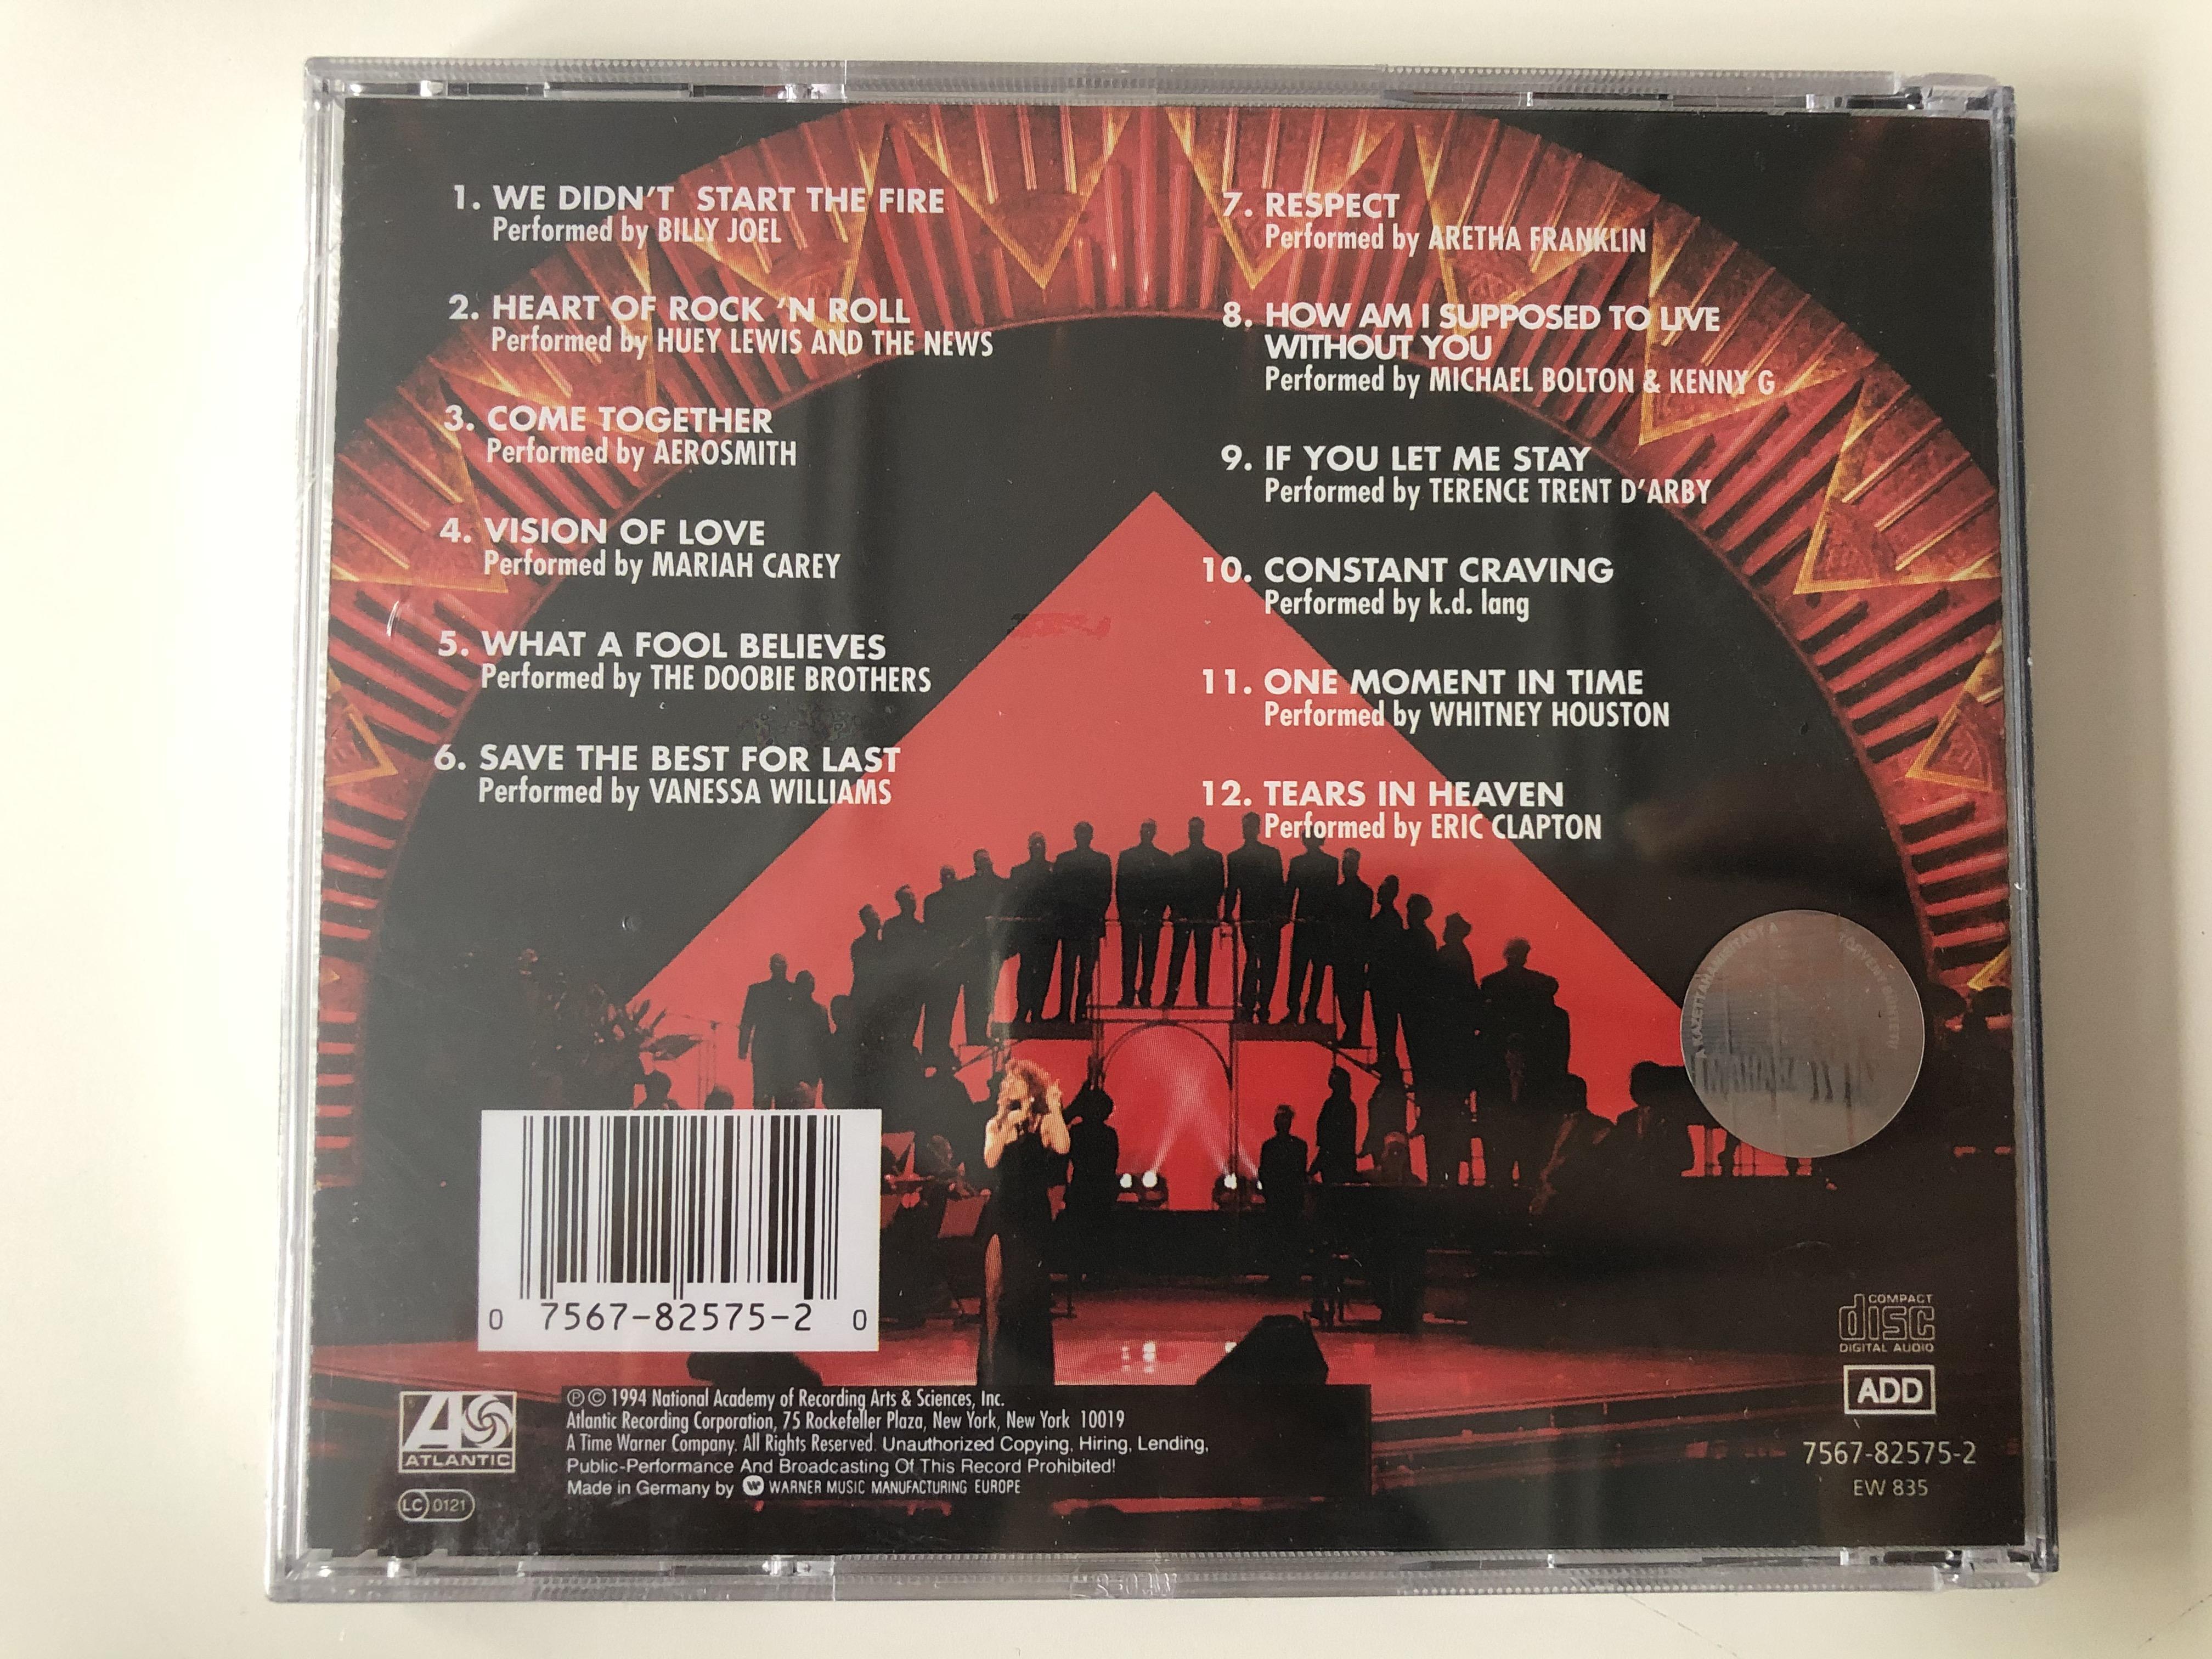 grammy-s-greatest-moments-volume-ii-atlantic-audio-cd-1994-7567-82575-2-2-.jpg